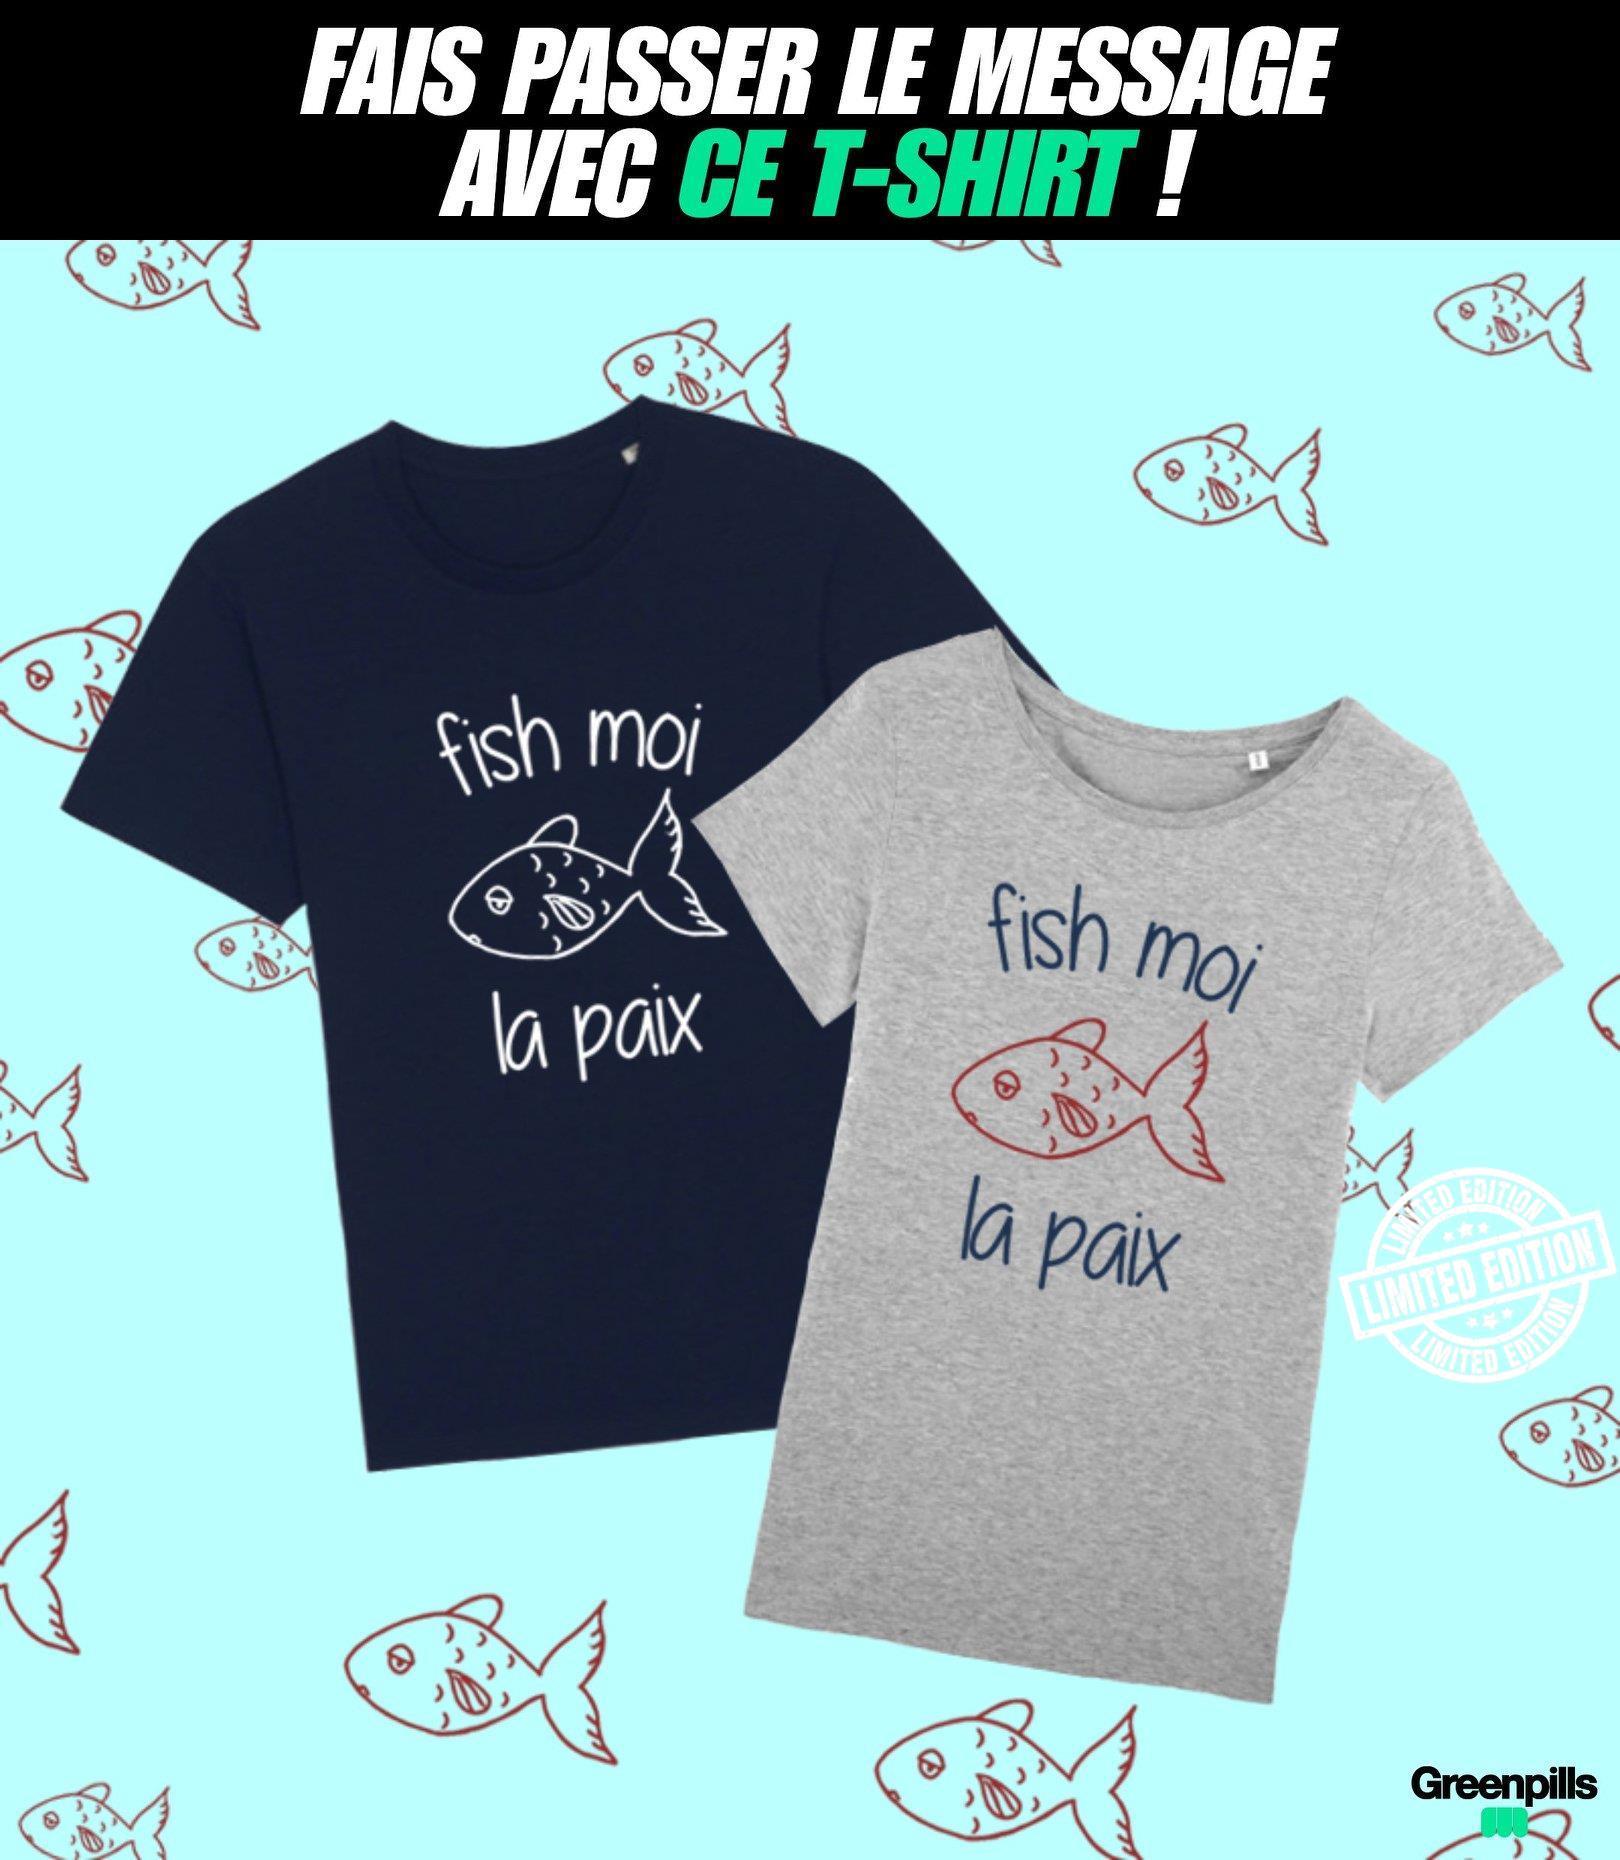 Fish moi la paix shirt